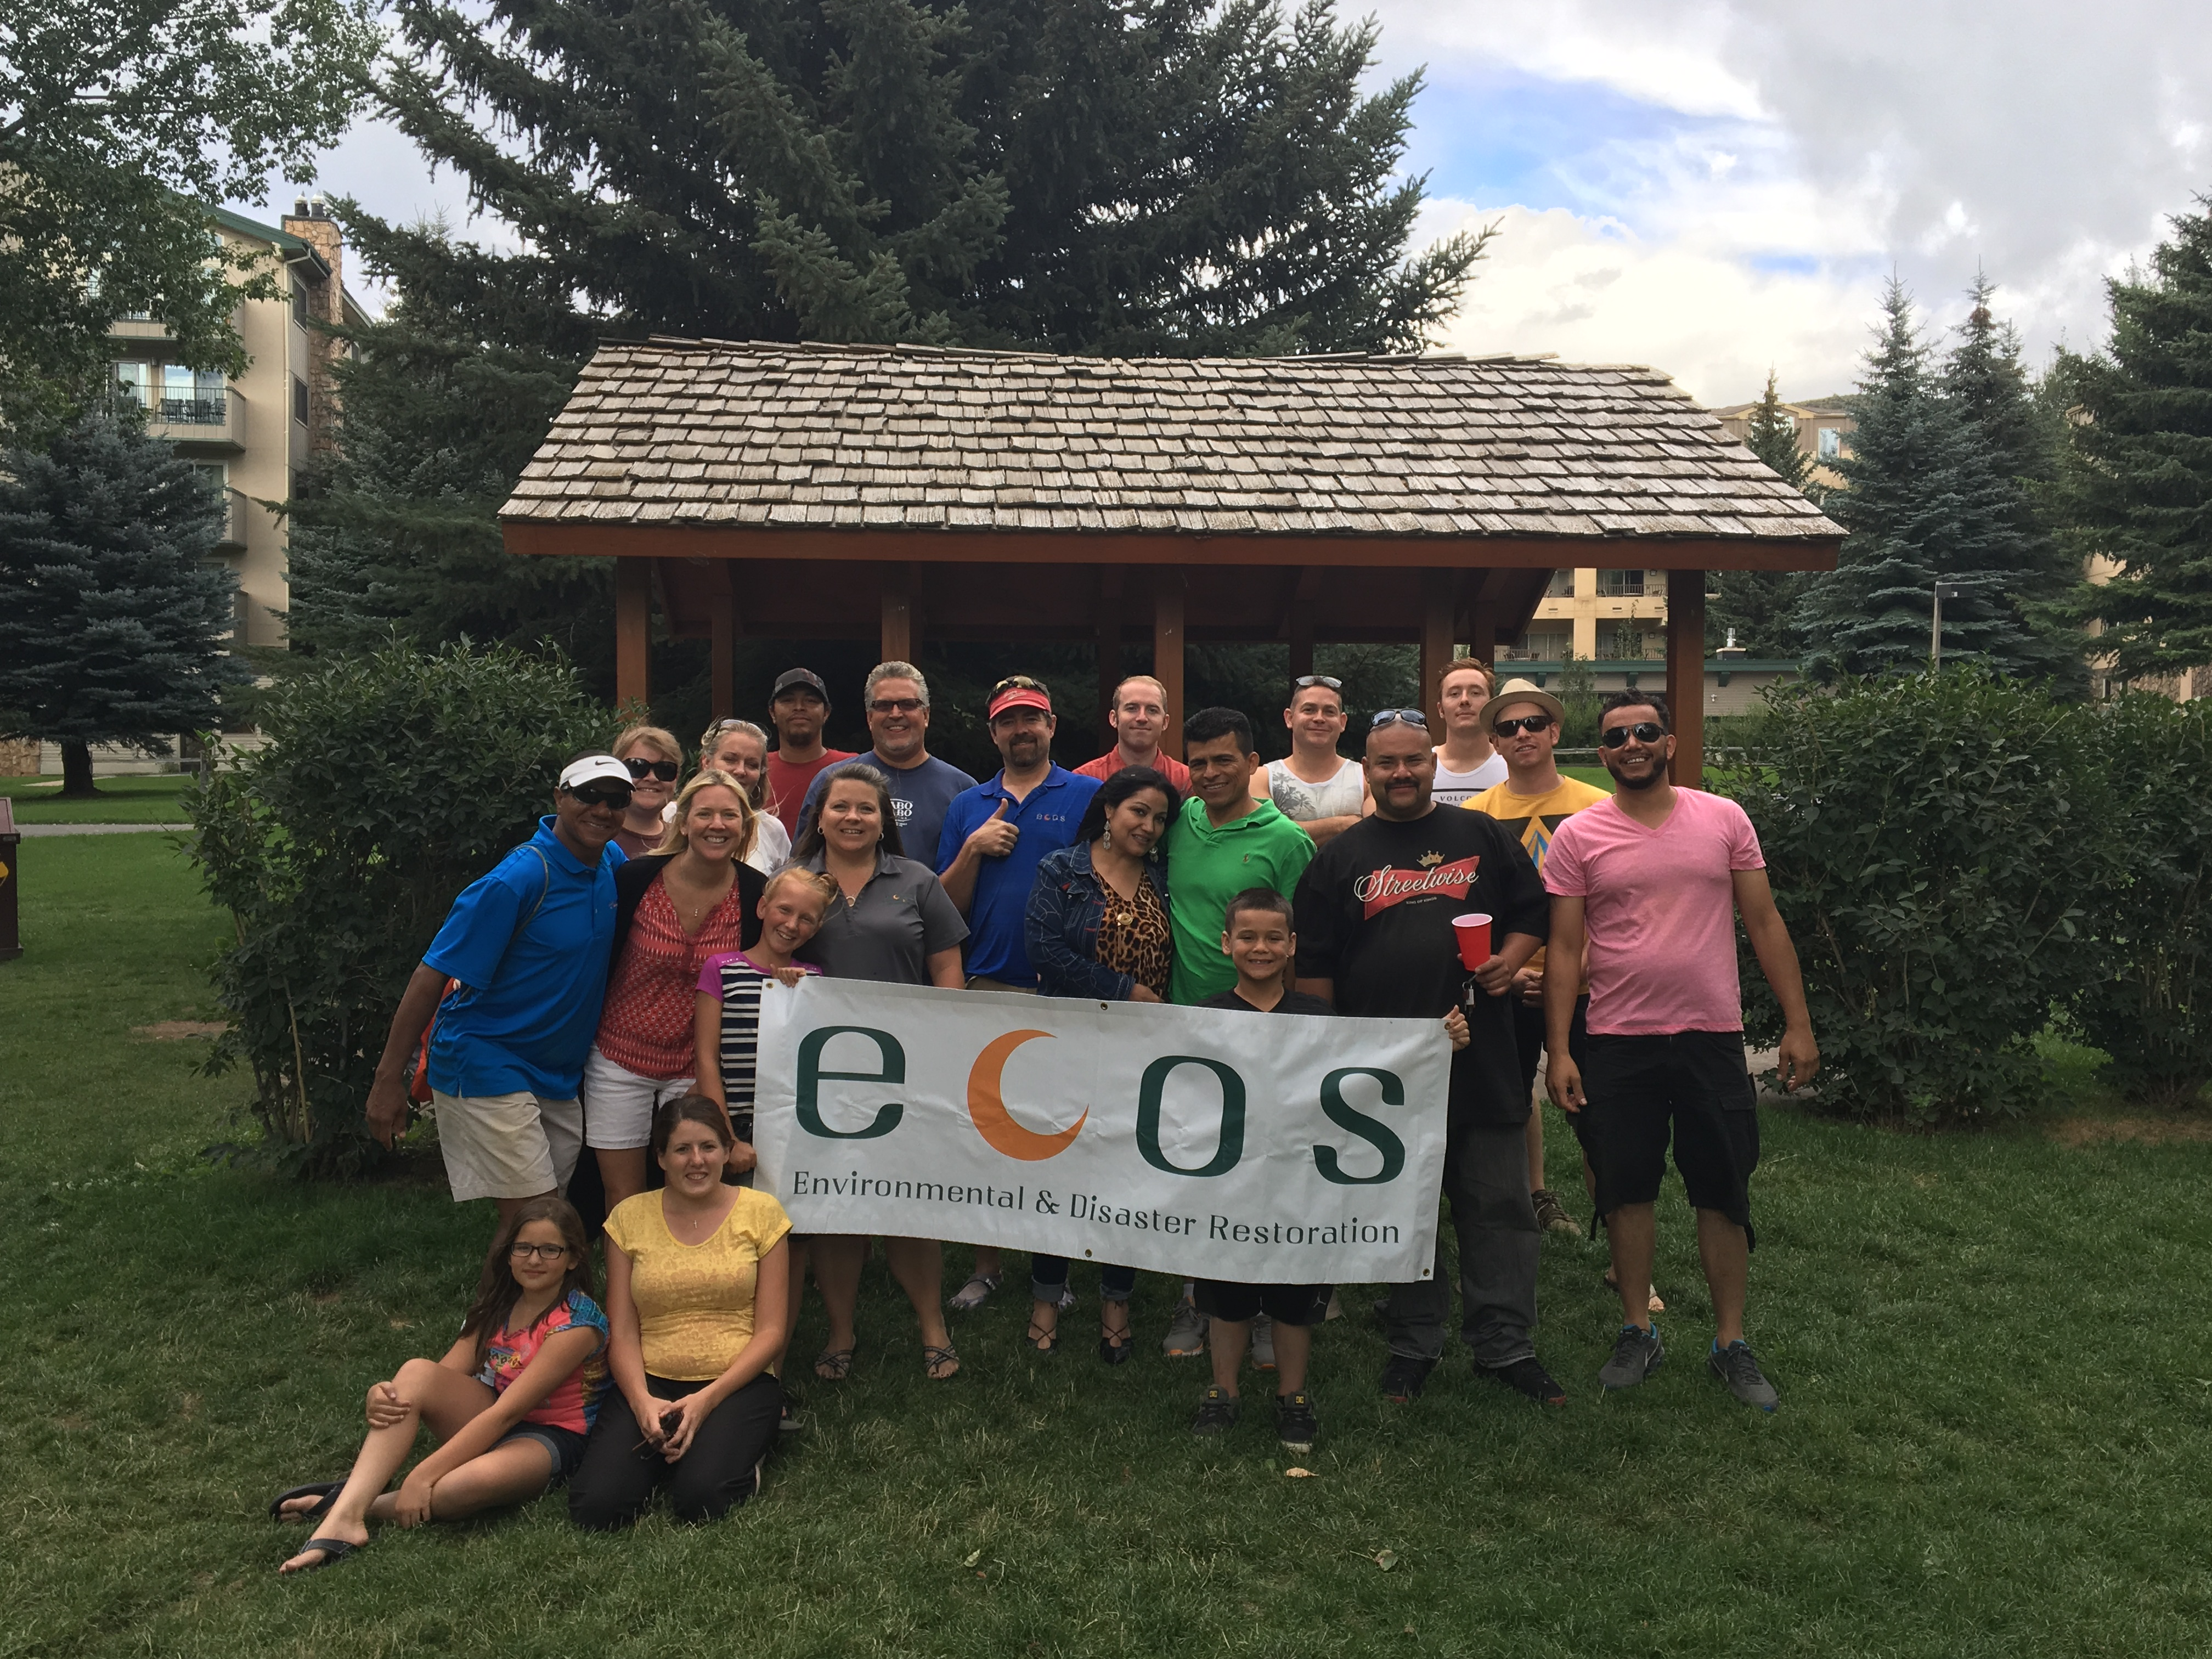 Ecos Environmental Amp Disaster Restoration Inc Denver